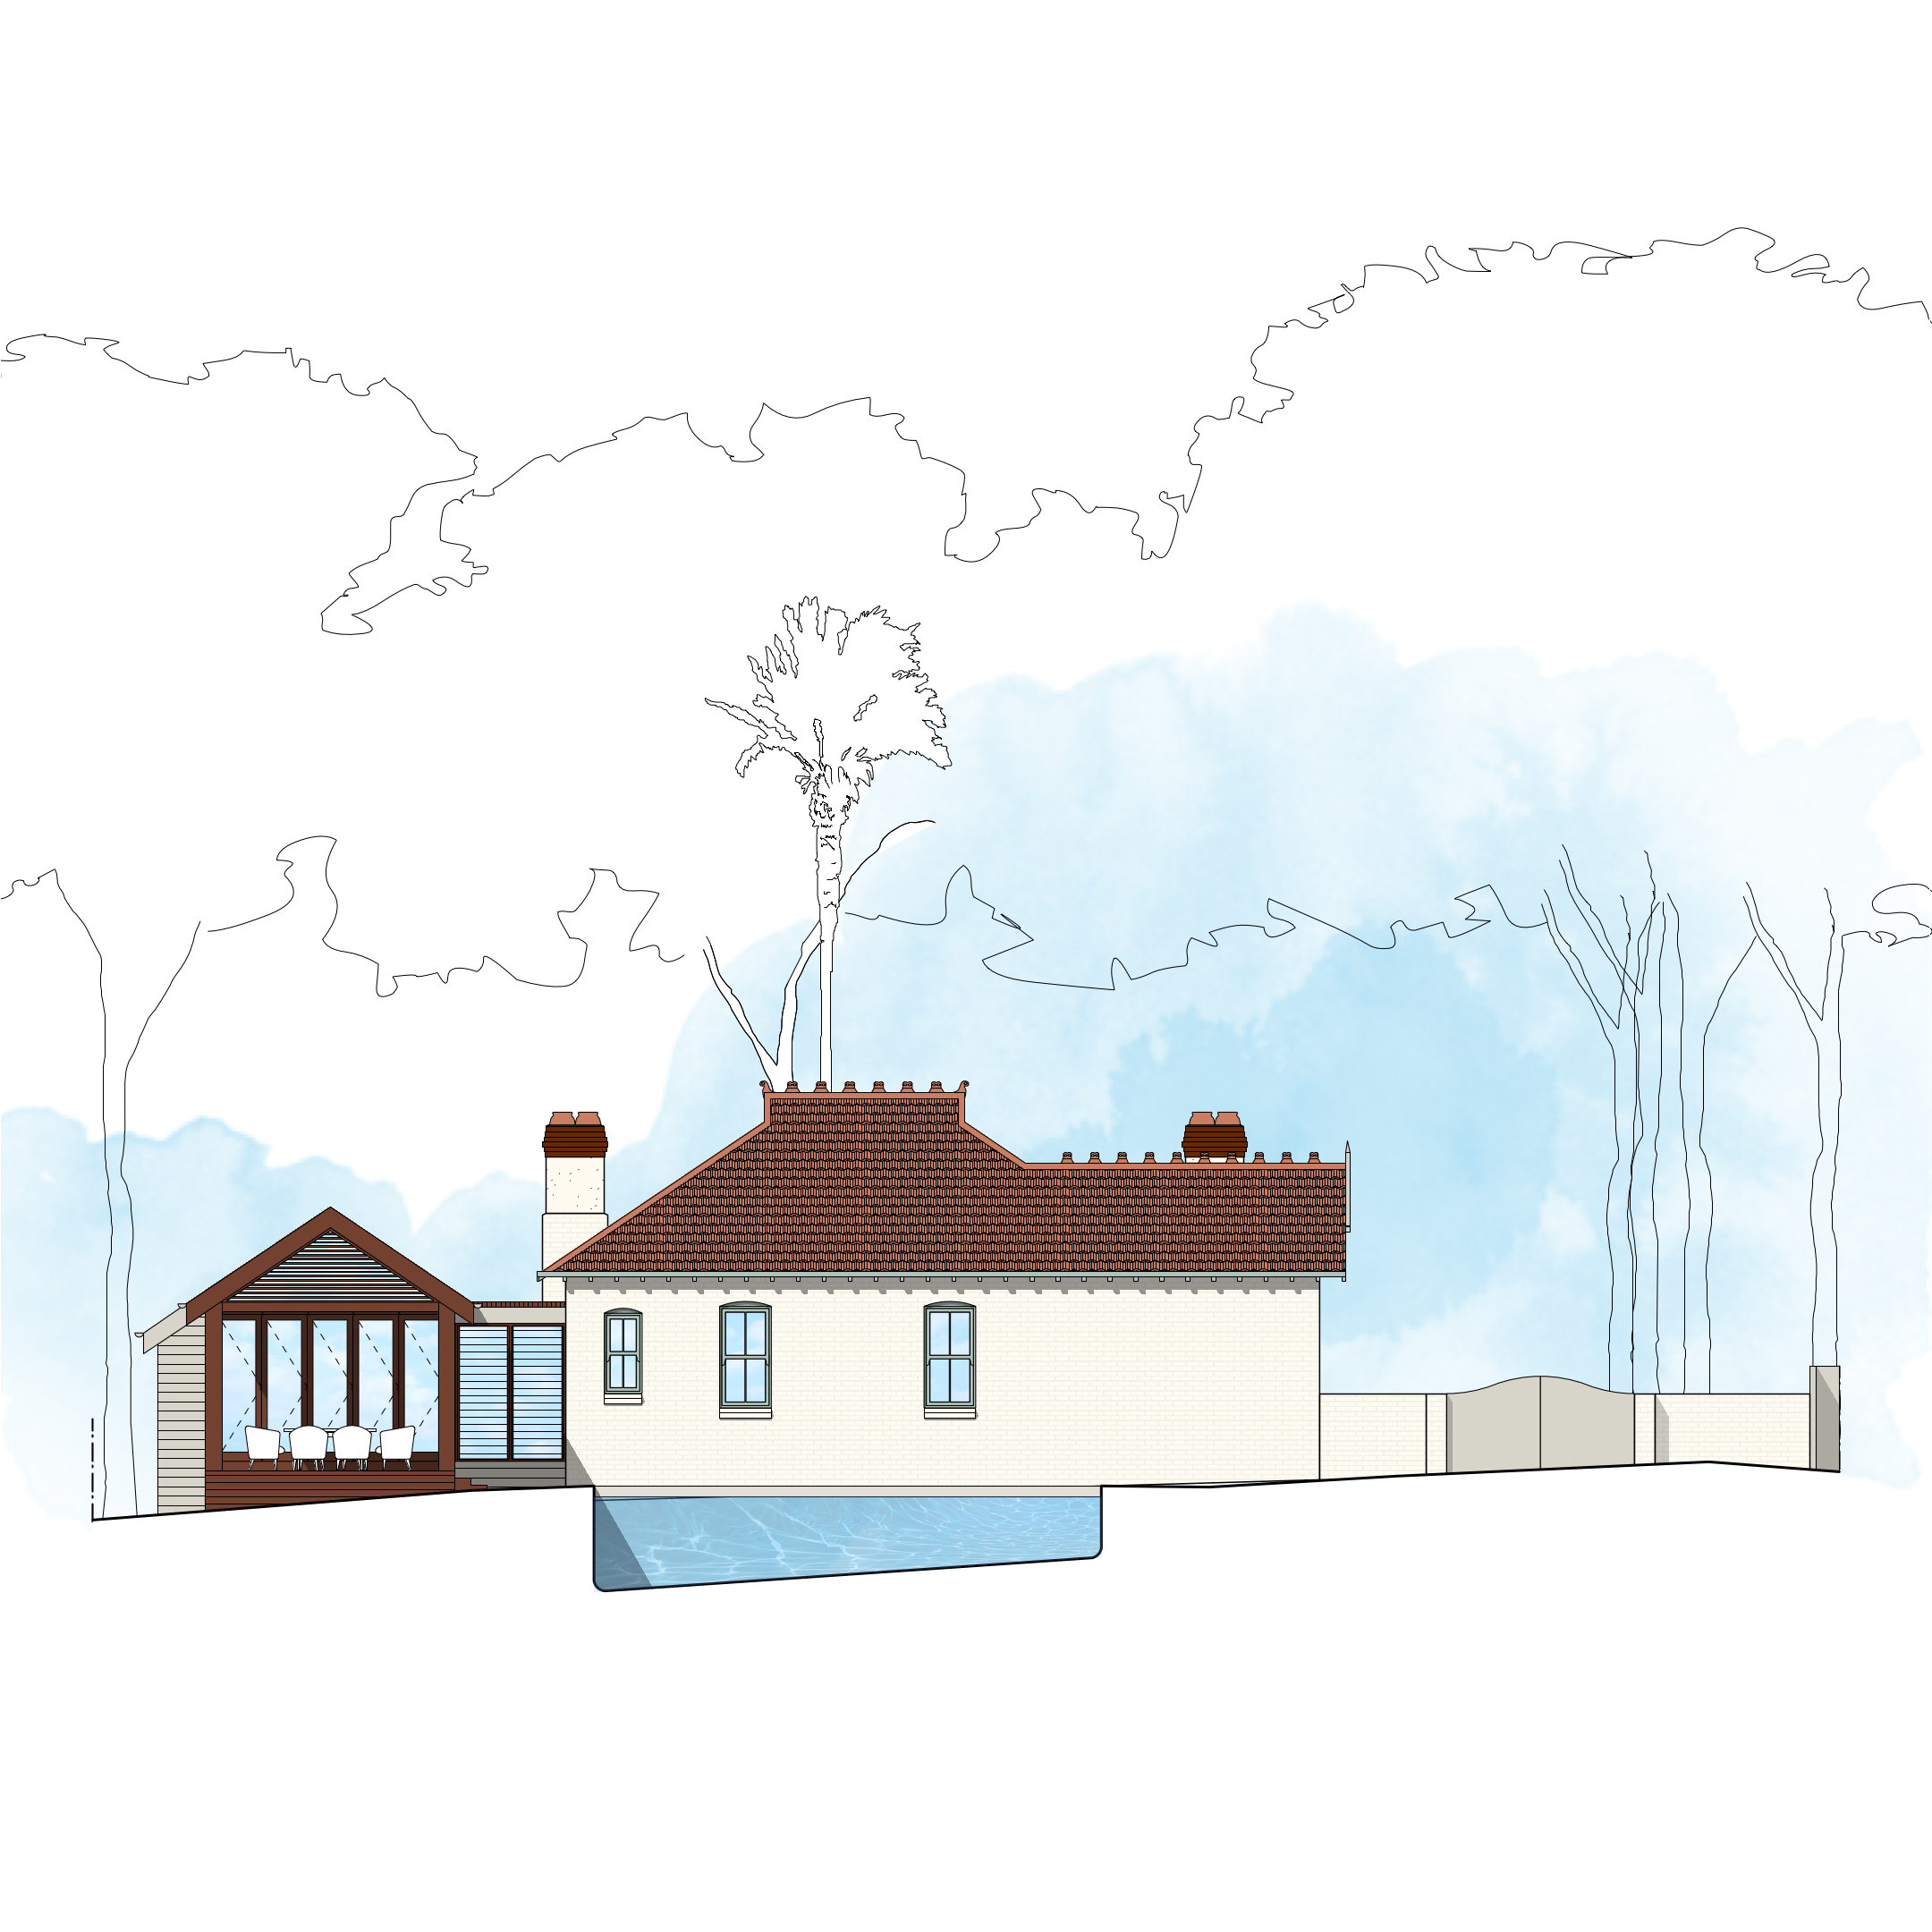 James Allen Architect Beecroft Beecroft House 3.jpg